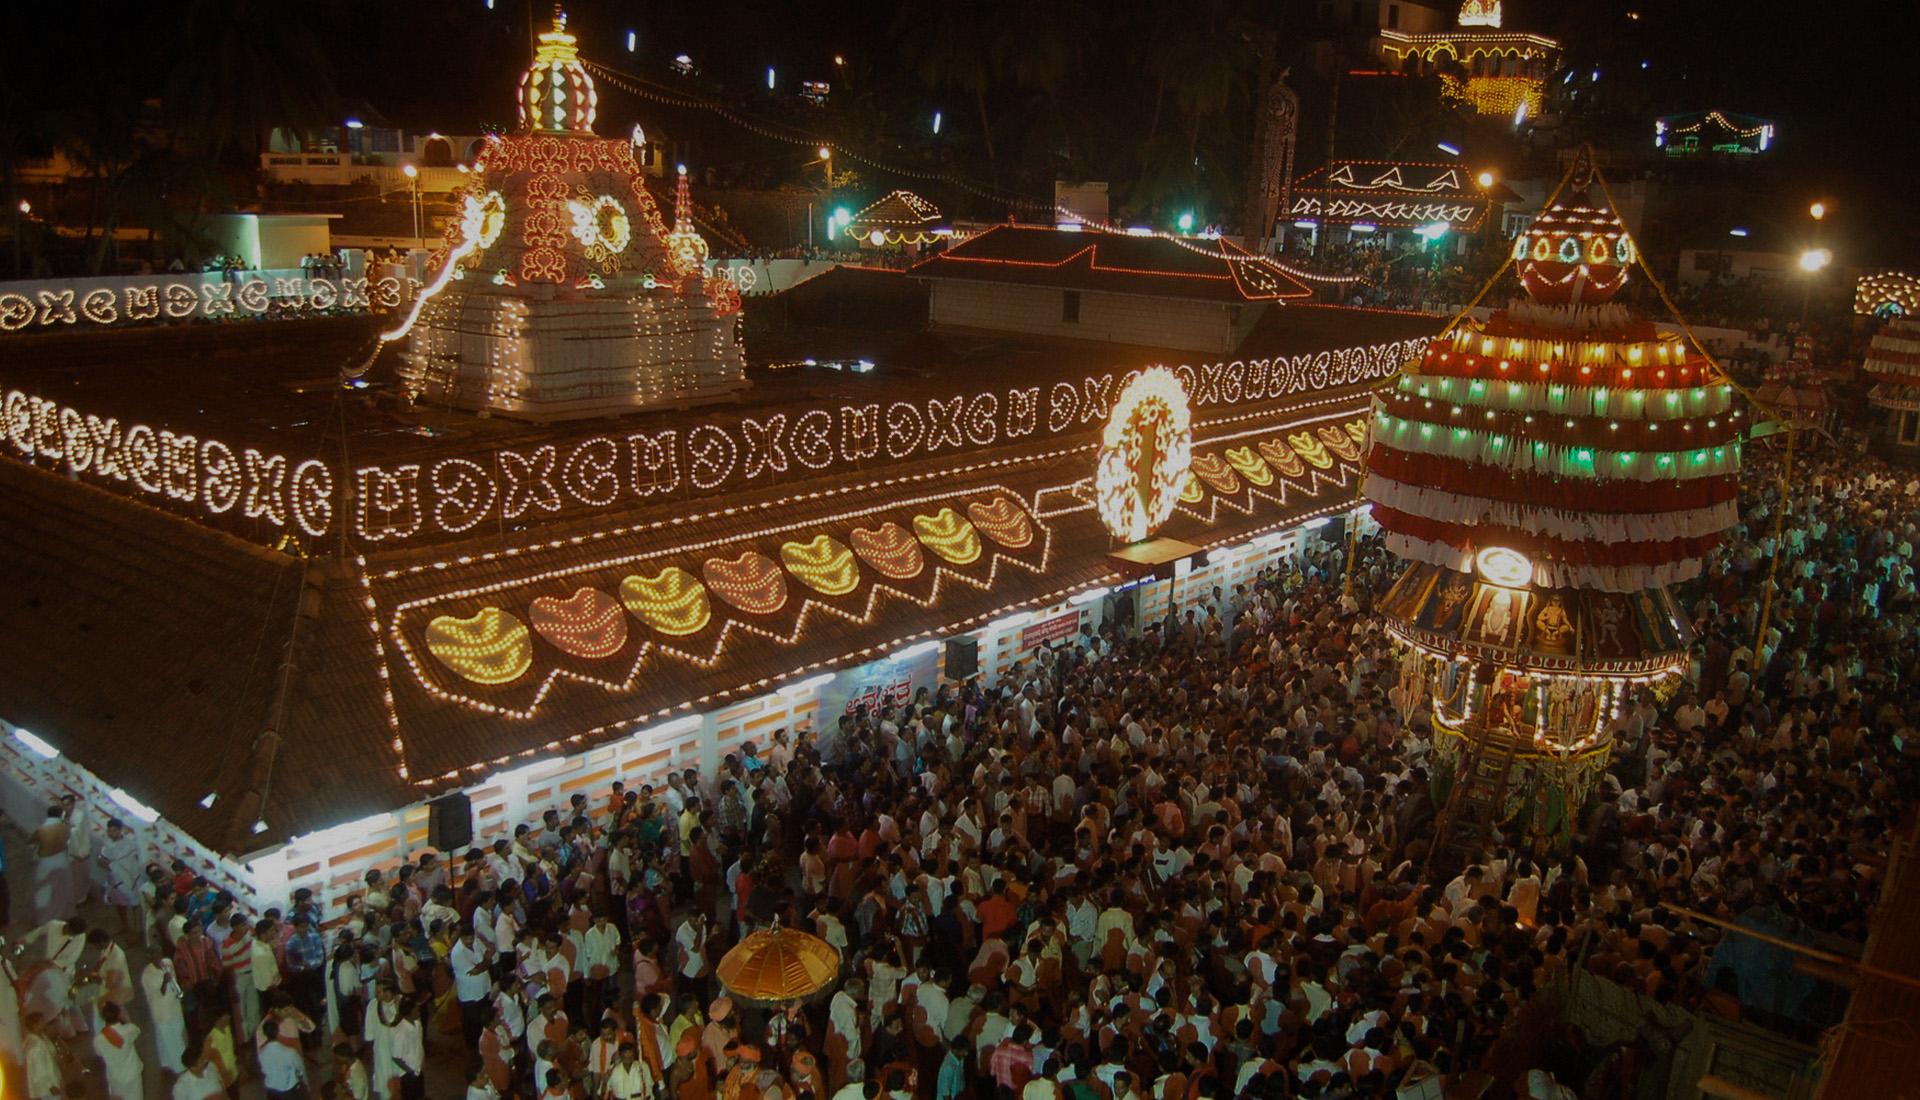 Kateelu Durgaparameshwari Temple